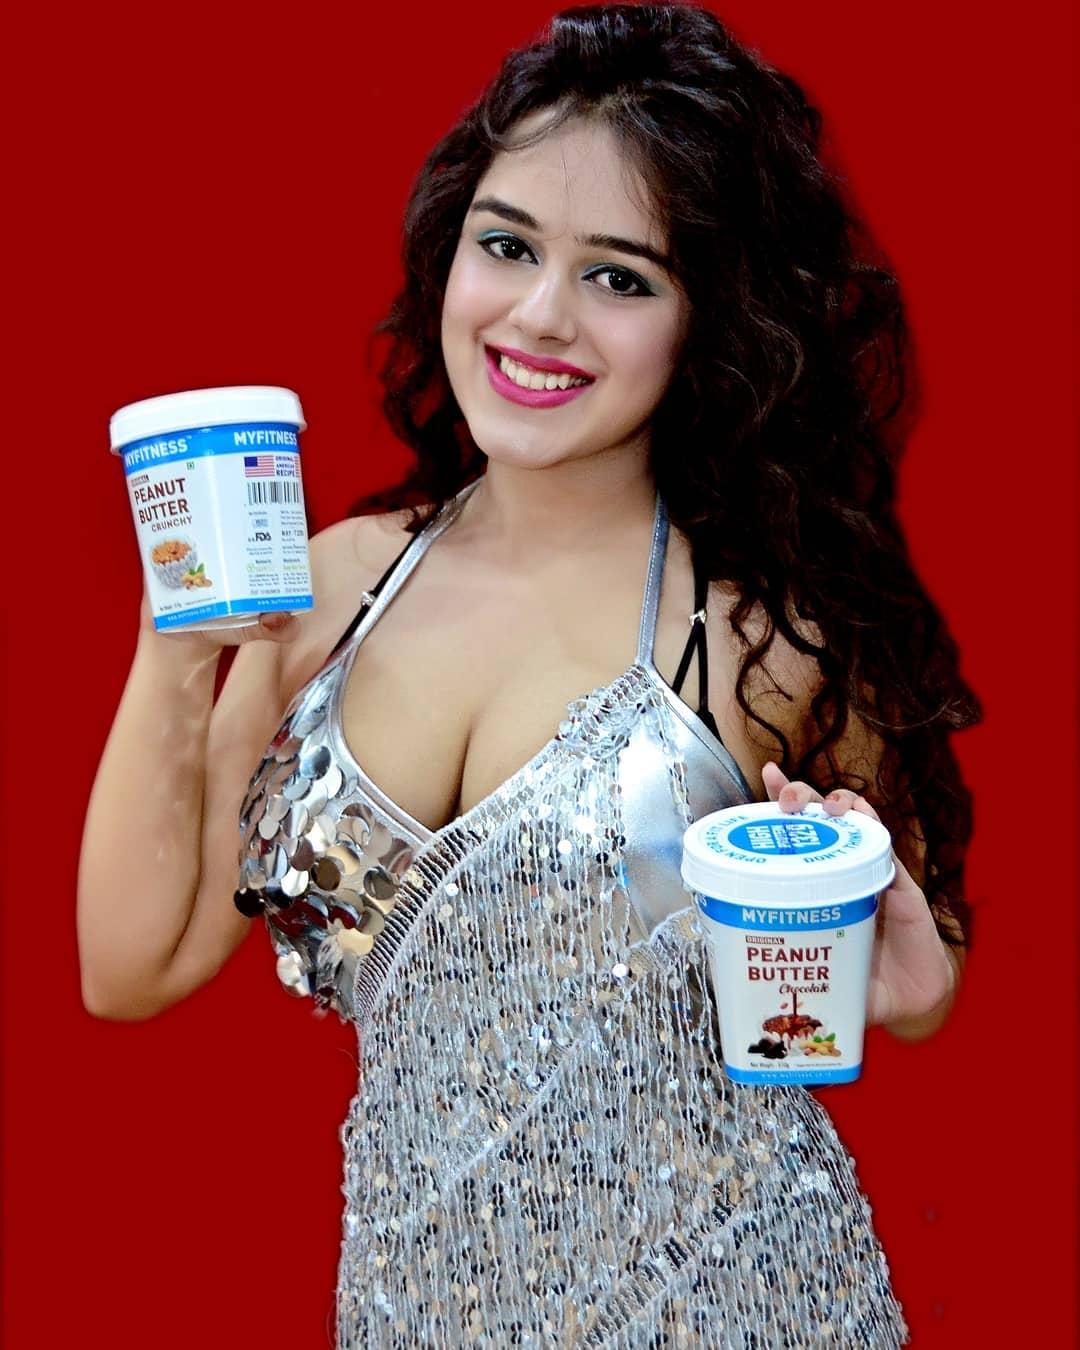 Mushkan varshney webseries actress hot photos gallery